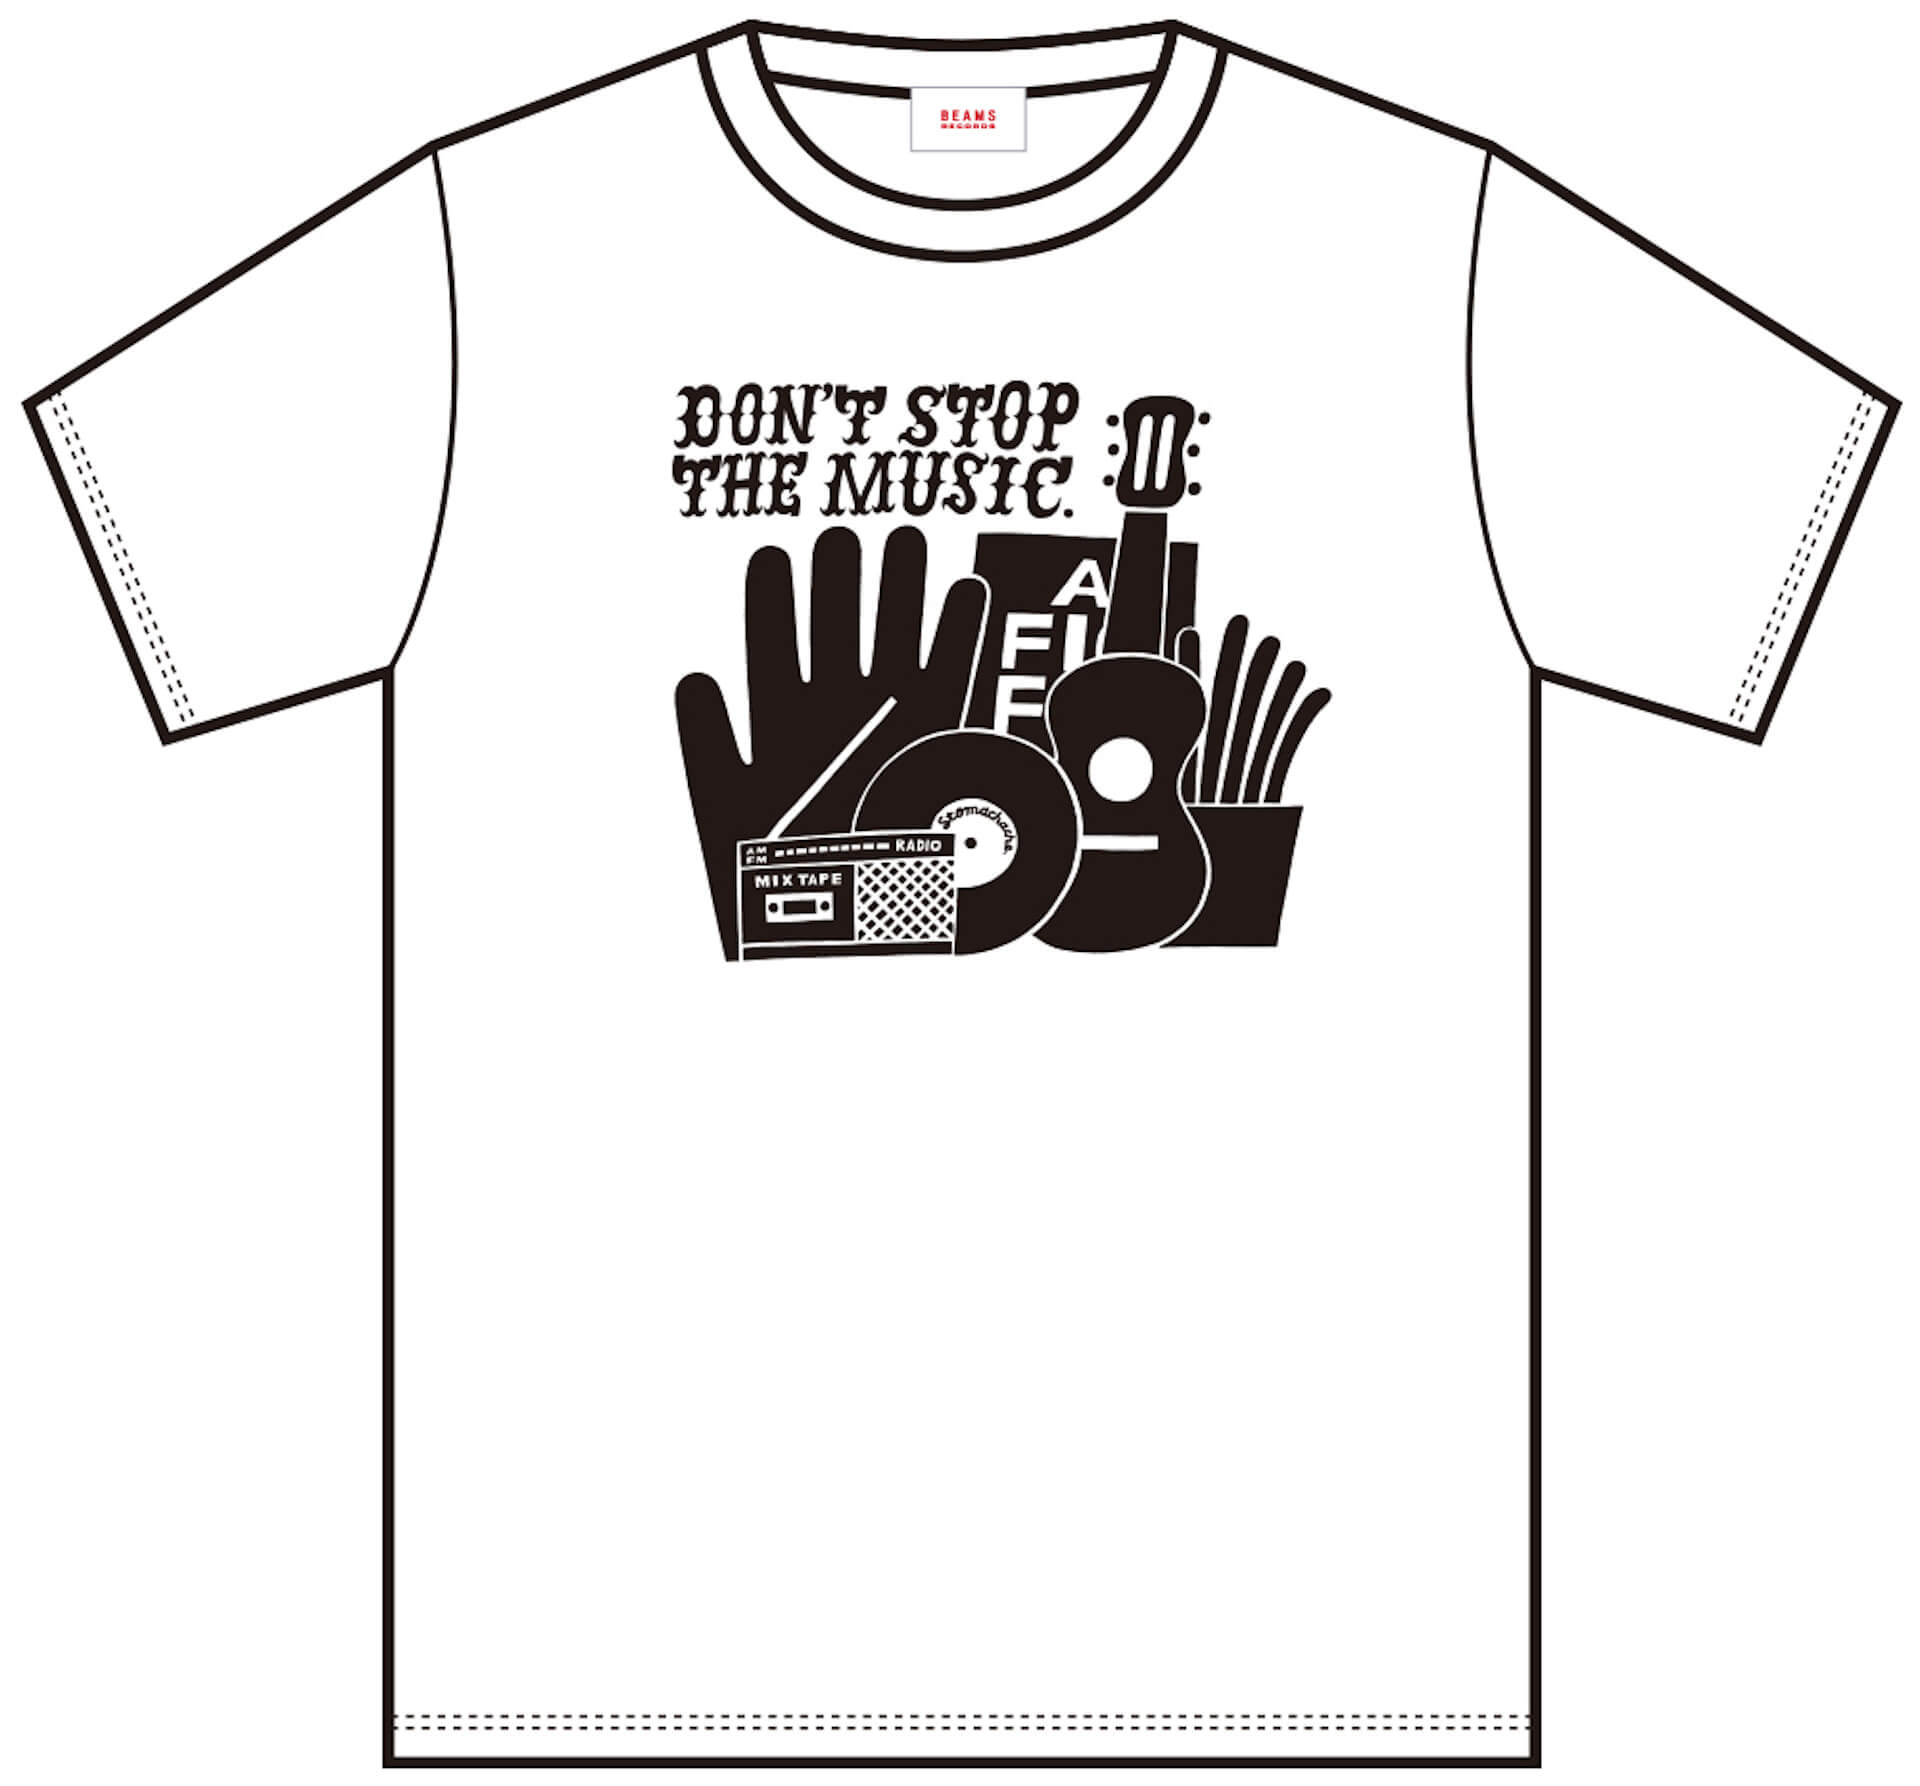 J-WAVE「#音楽を止めるな」BEAMS RECORDS協力のもと、ライブハウスを支援するオリジナルTシャツが受注販売開始! lf200515_jwave_beamsrecords_tshirts_04